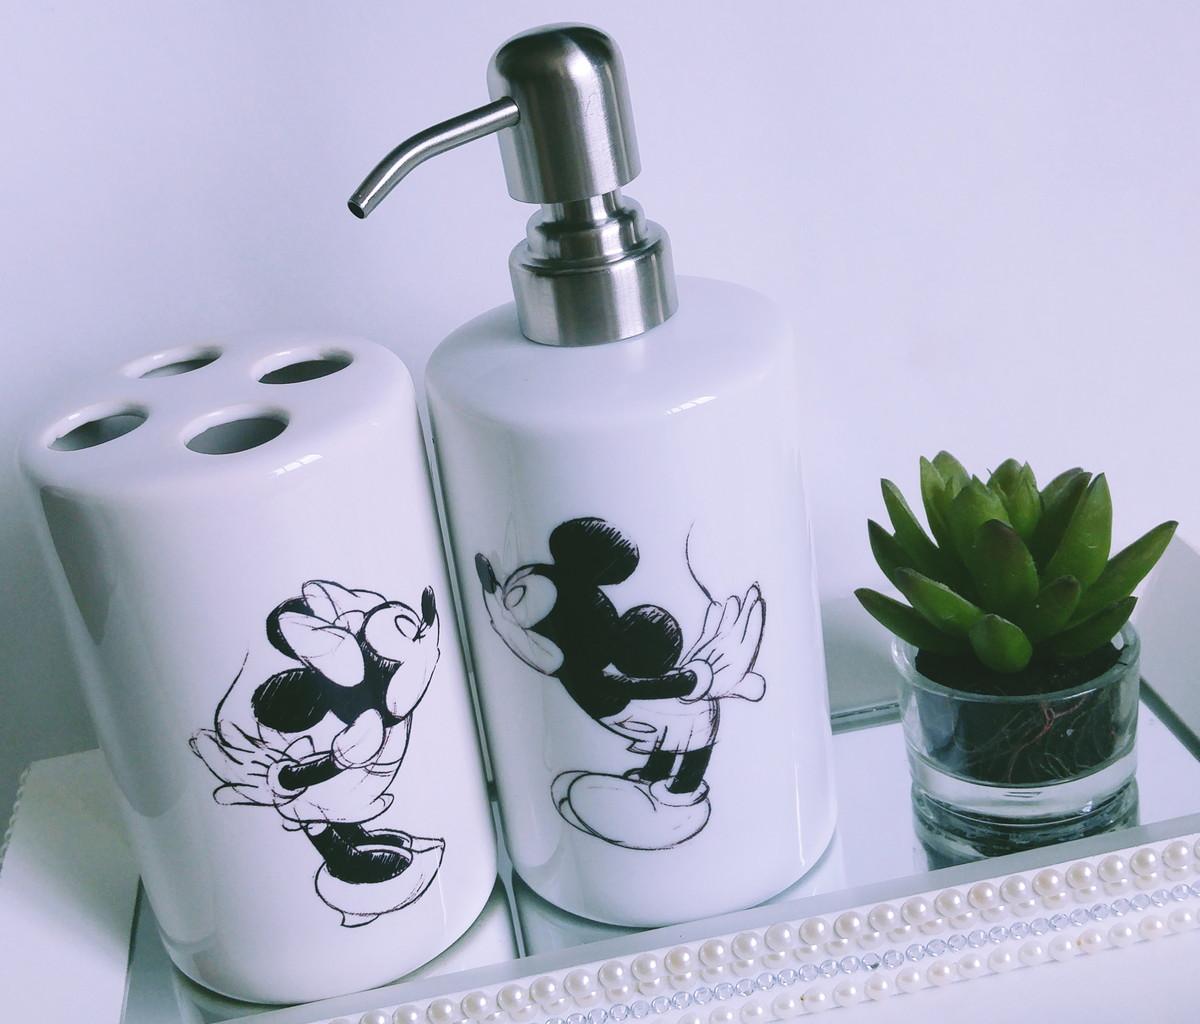 Kit Banheiro Porcelana Mickey : Kit saboneteira porta escovas mickey minnie beijo no